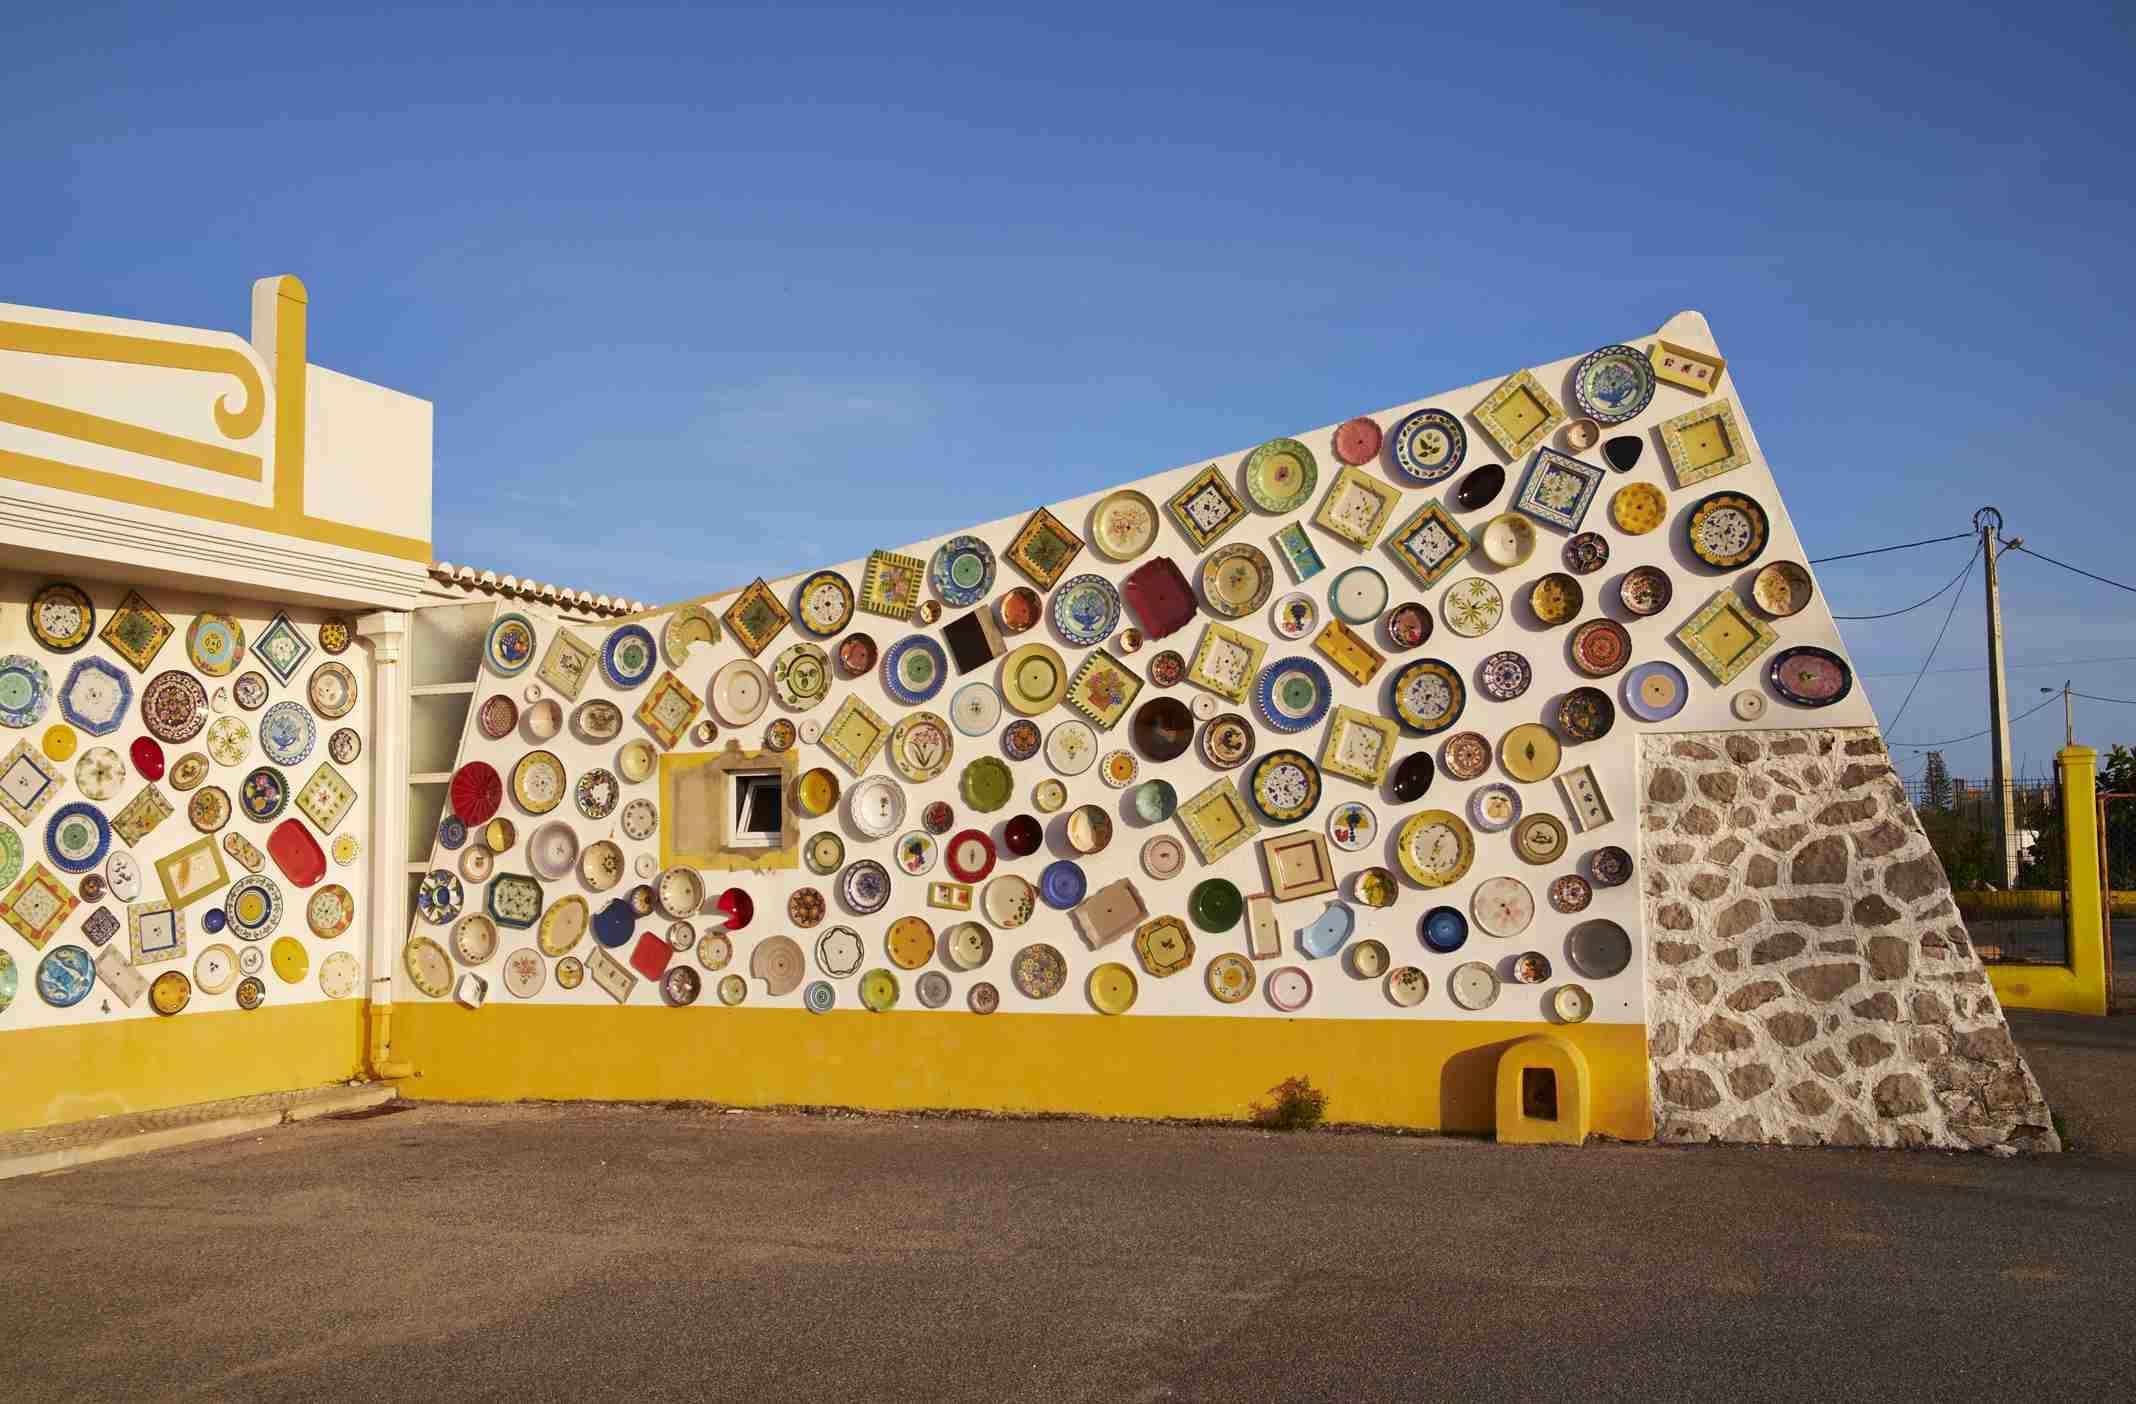 Portugal, Algarve, Sagres, wall with traditional Portuguese ceramics